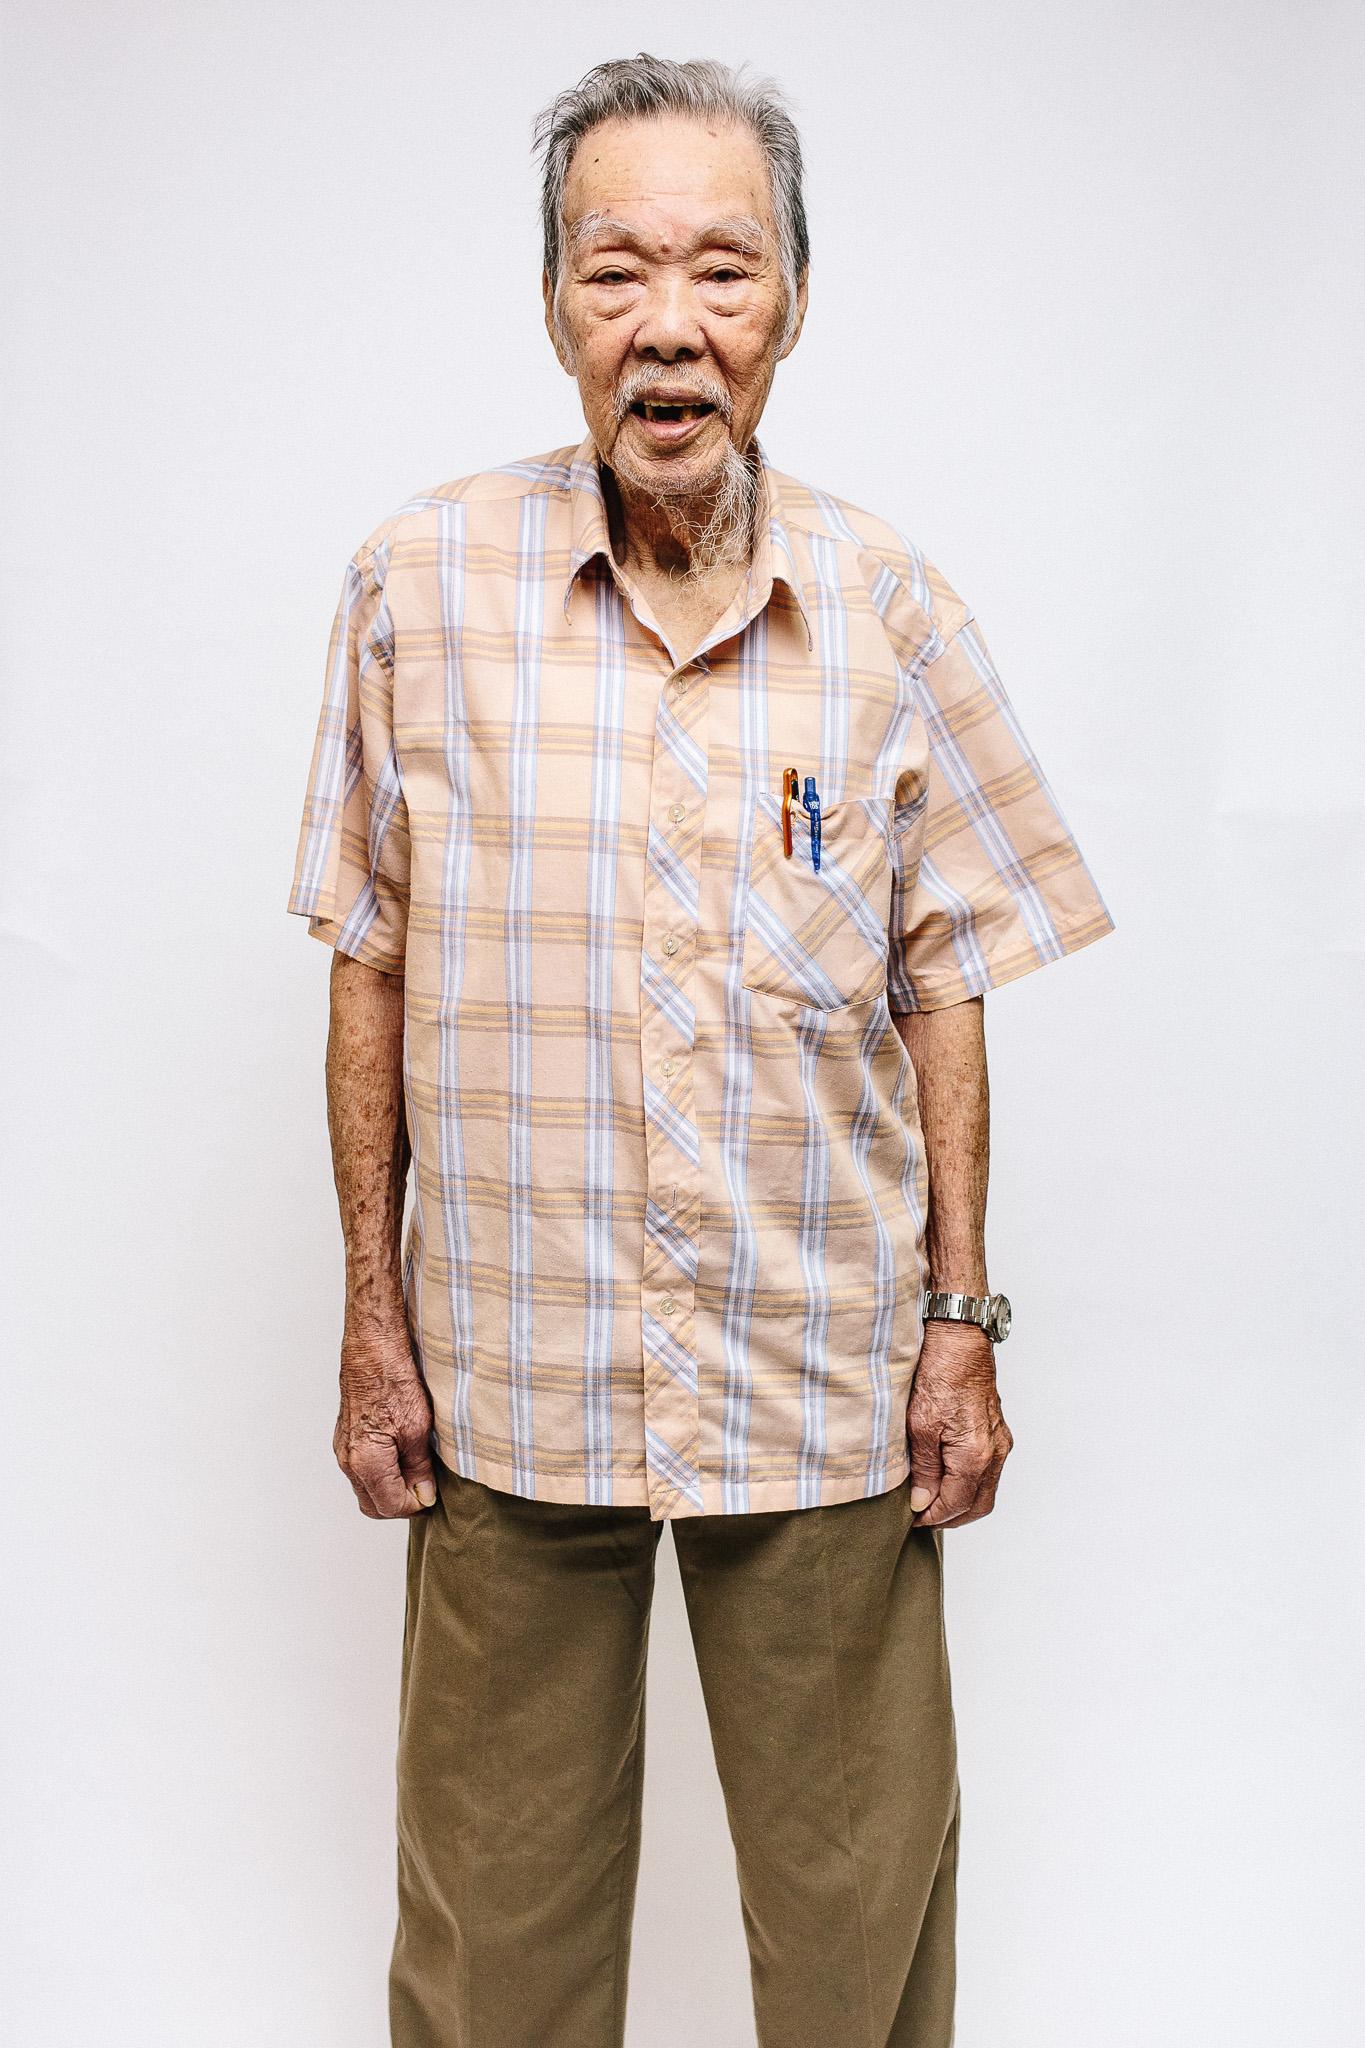 zainal-zainal-studio-centenarians-care-duke-nus-singapore-photographer-06.jpg